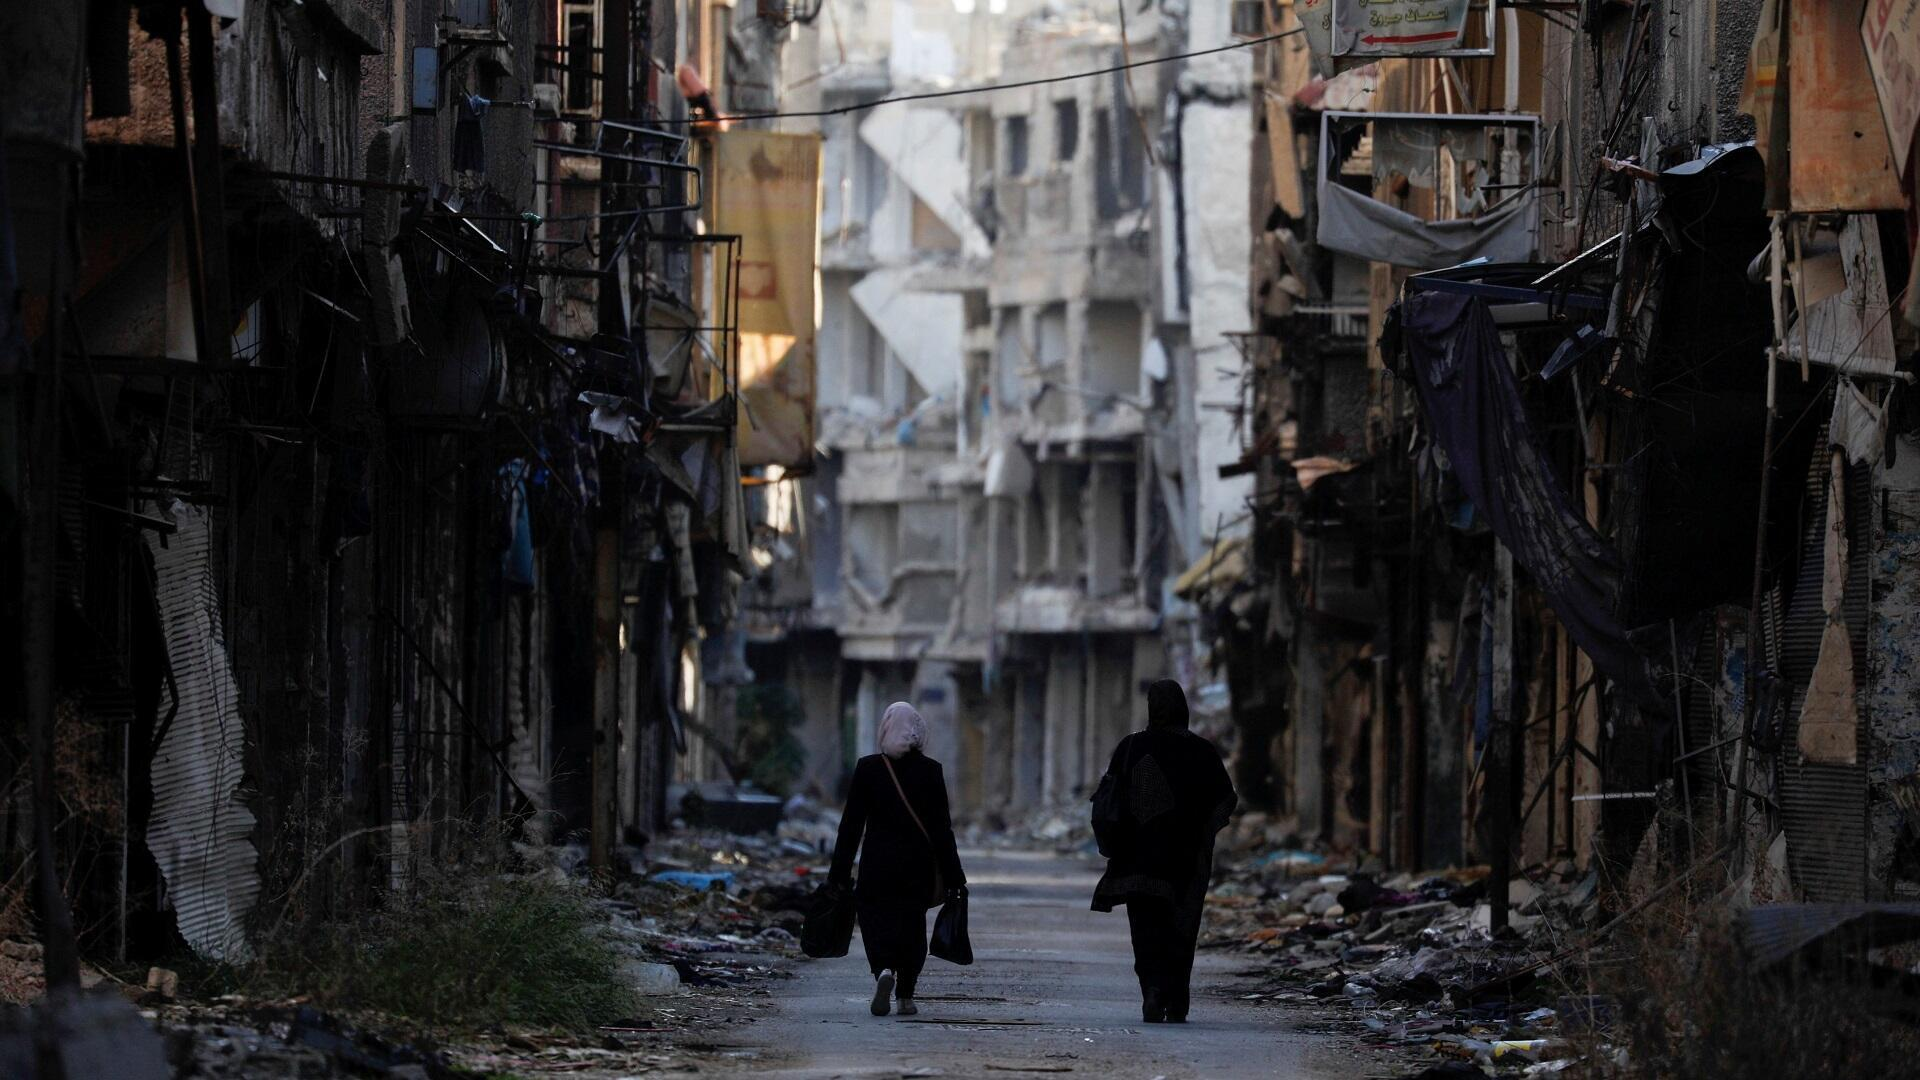 2021-09-14T113037Z_724755842_RC2NPP9Q40NO_RTRMADP_3_SYRIA-SECURITY-UN